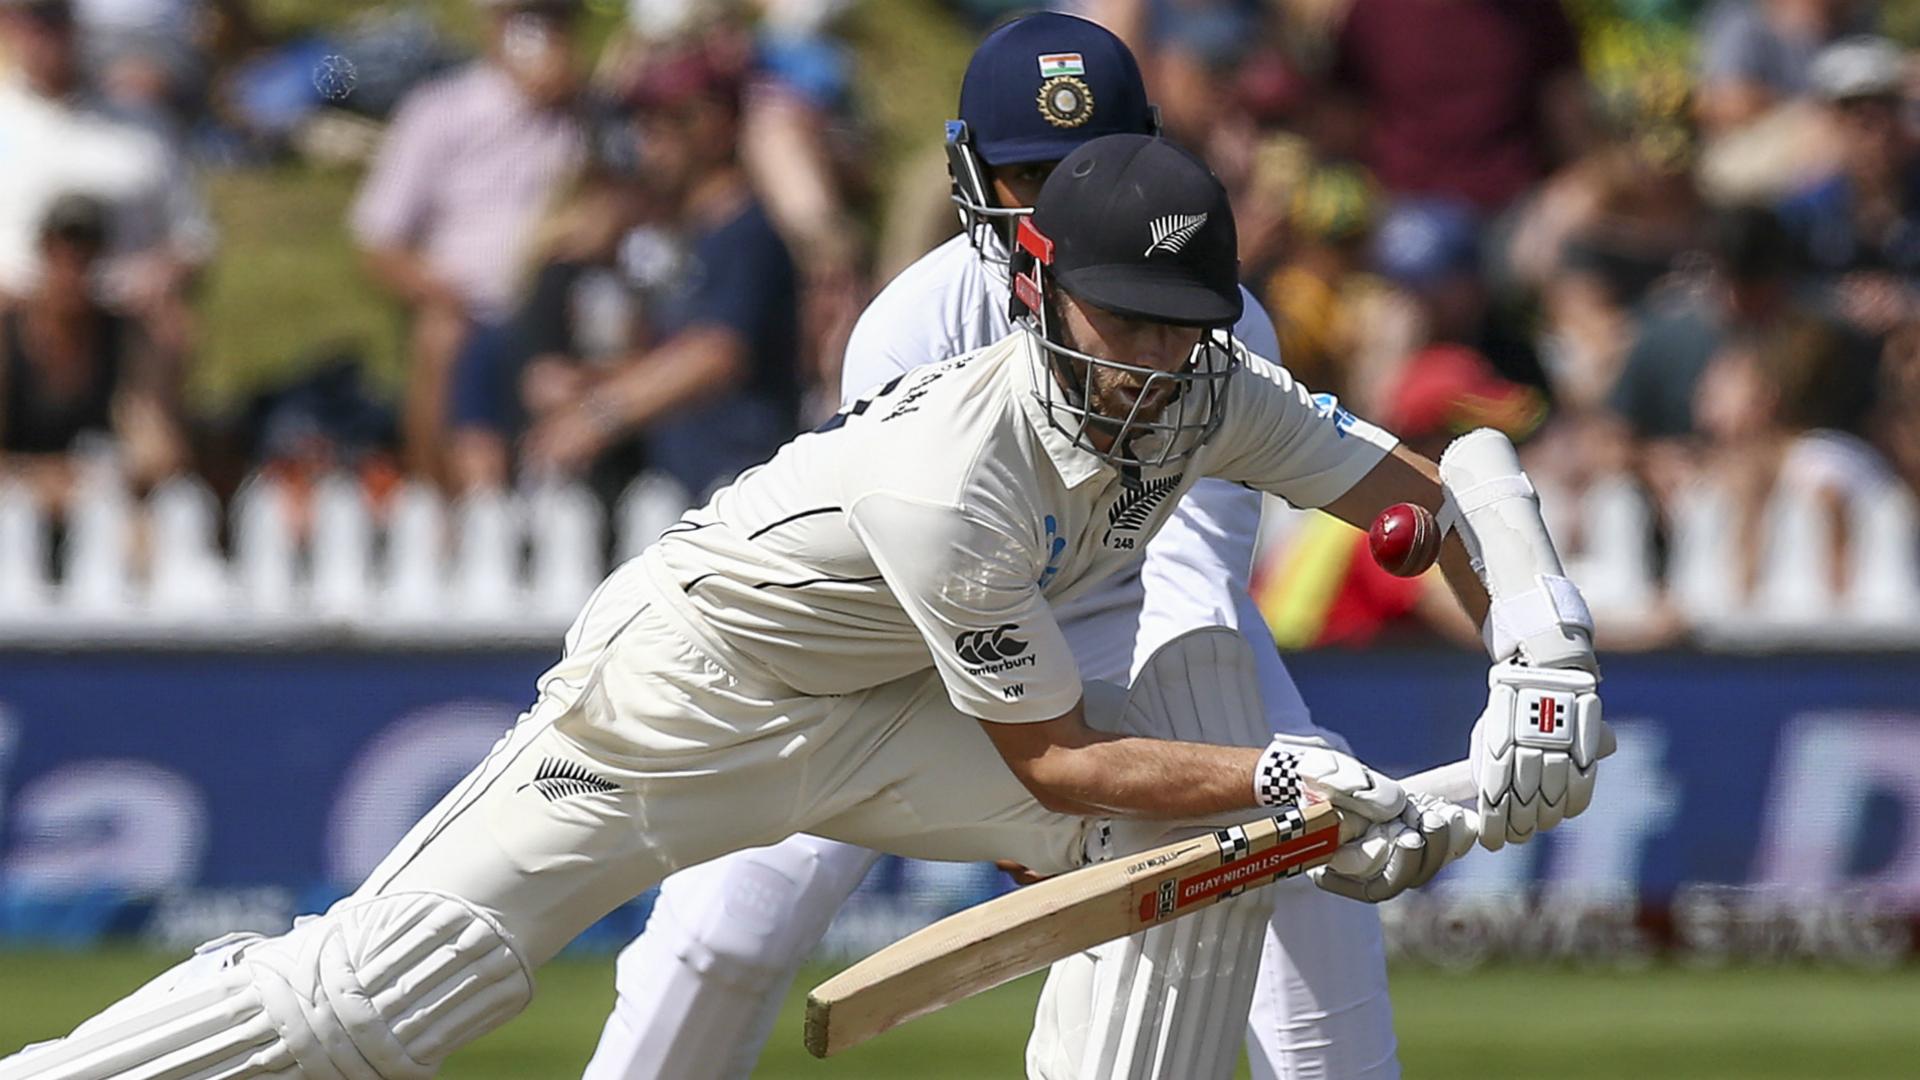 Black Caps eye Pakistan whitewash and Lord's Test Championship final